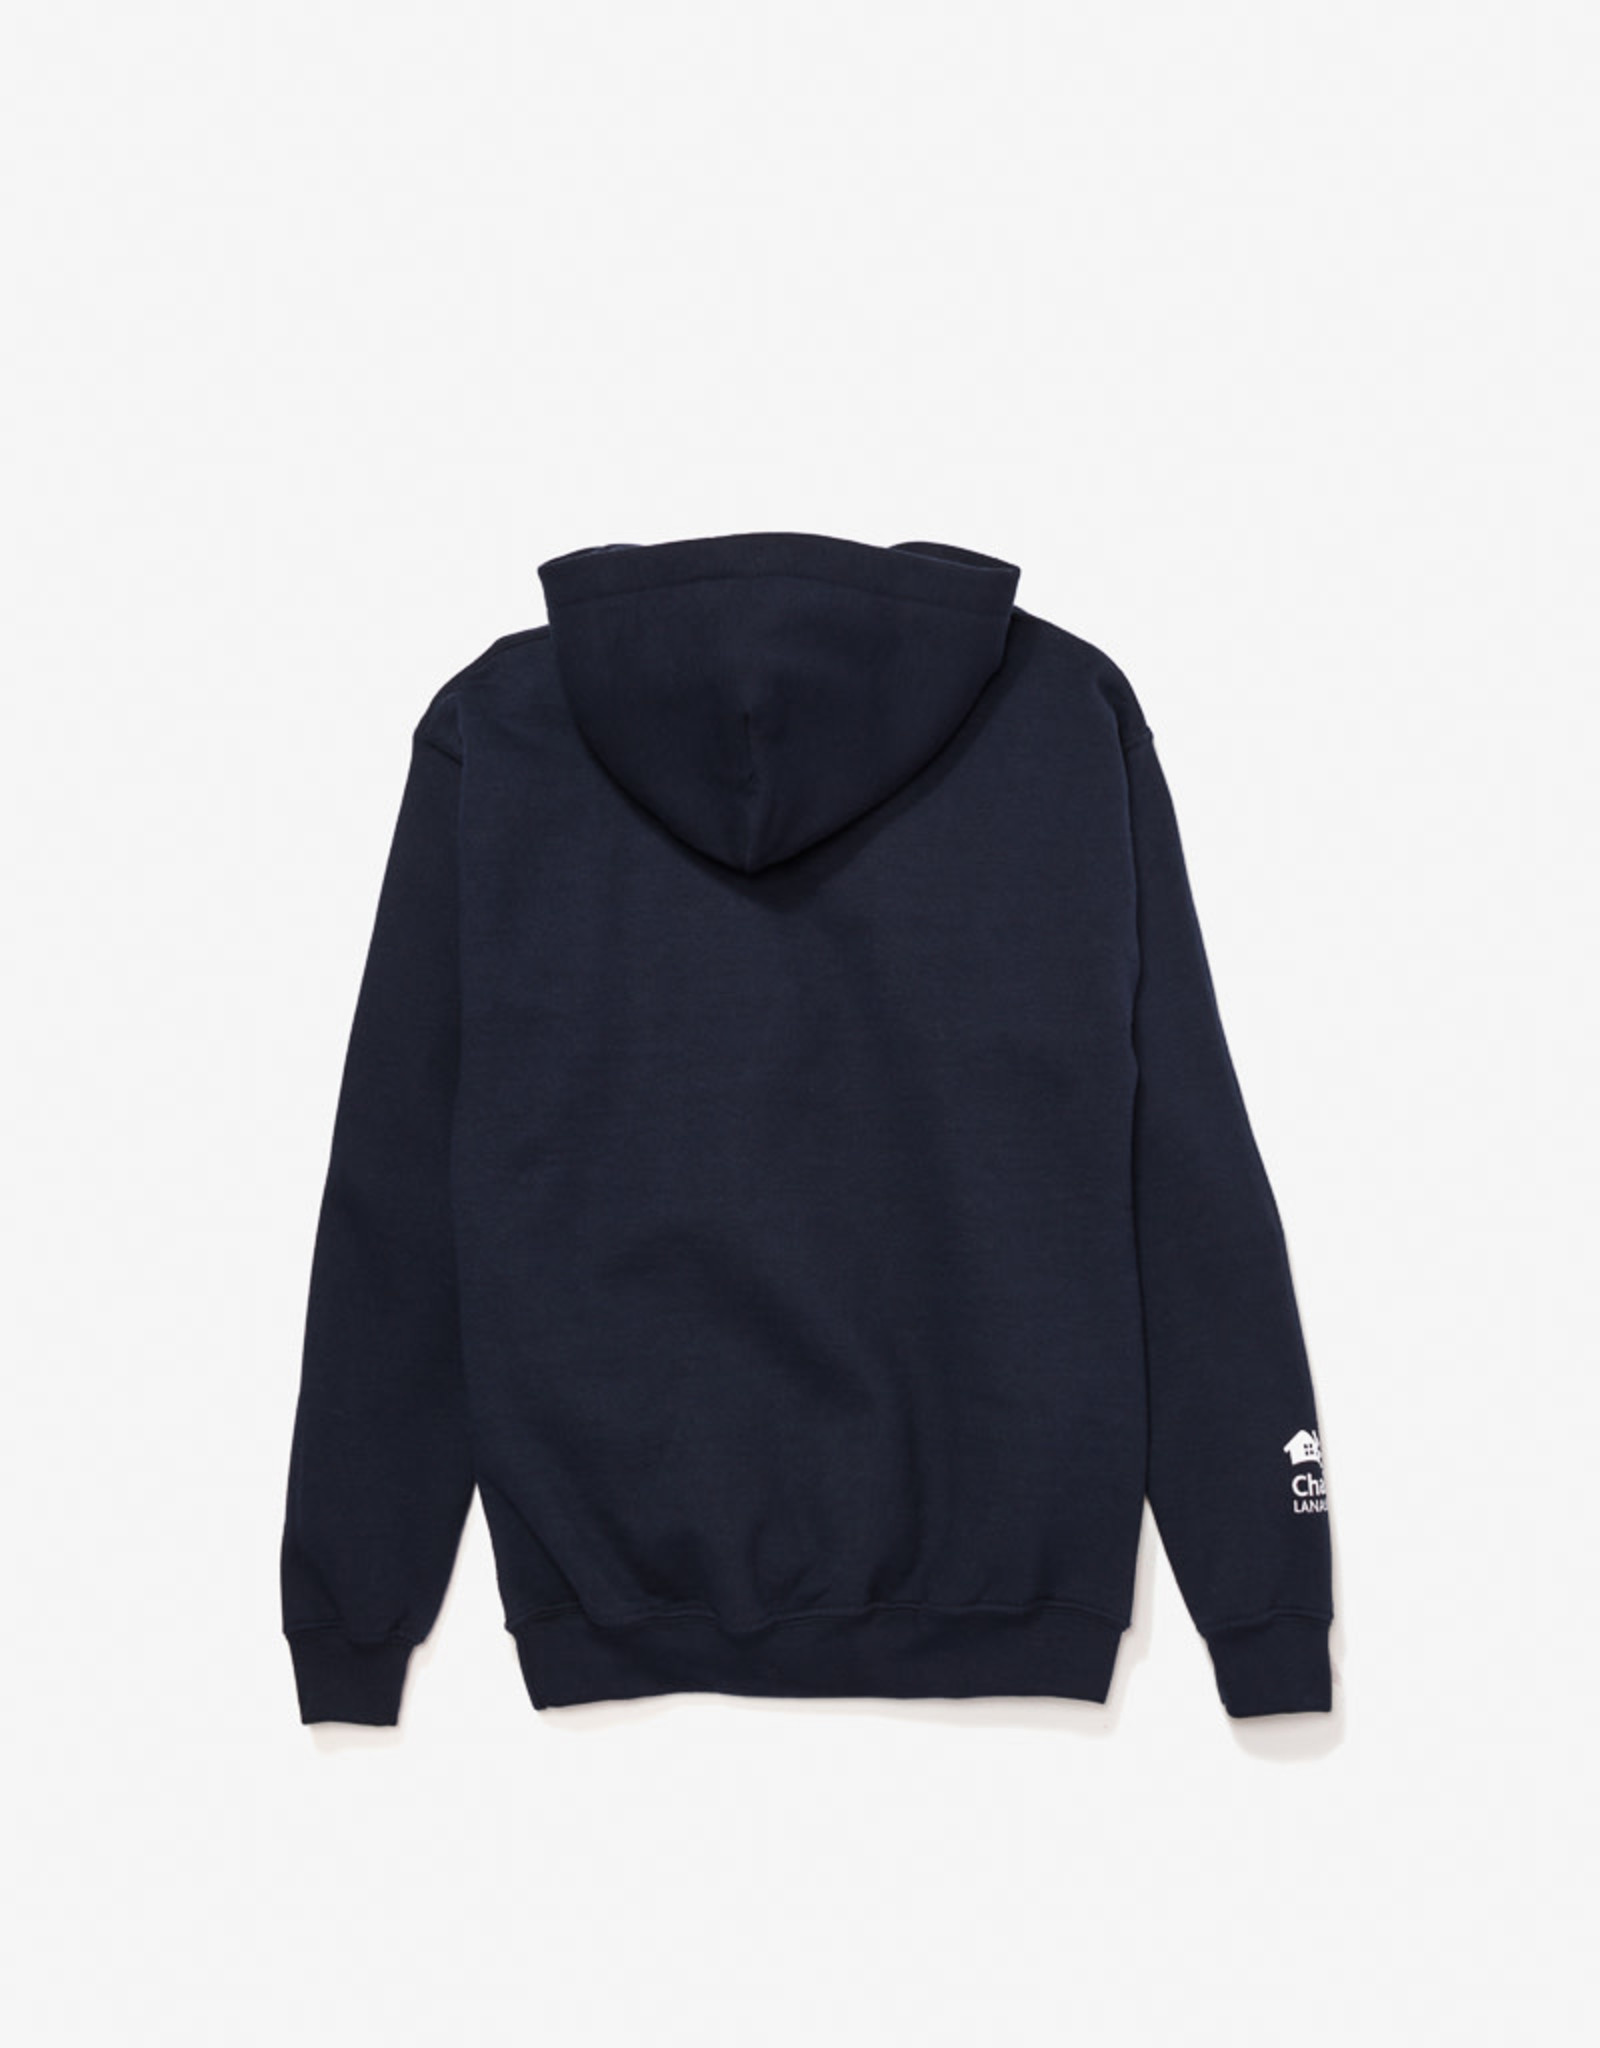 GILDAN Navy blue kangaroo printed sweatshirt for children